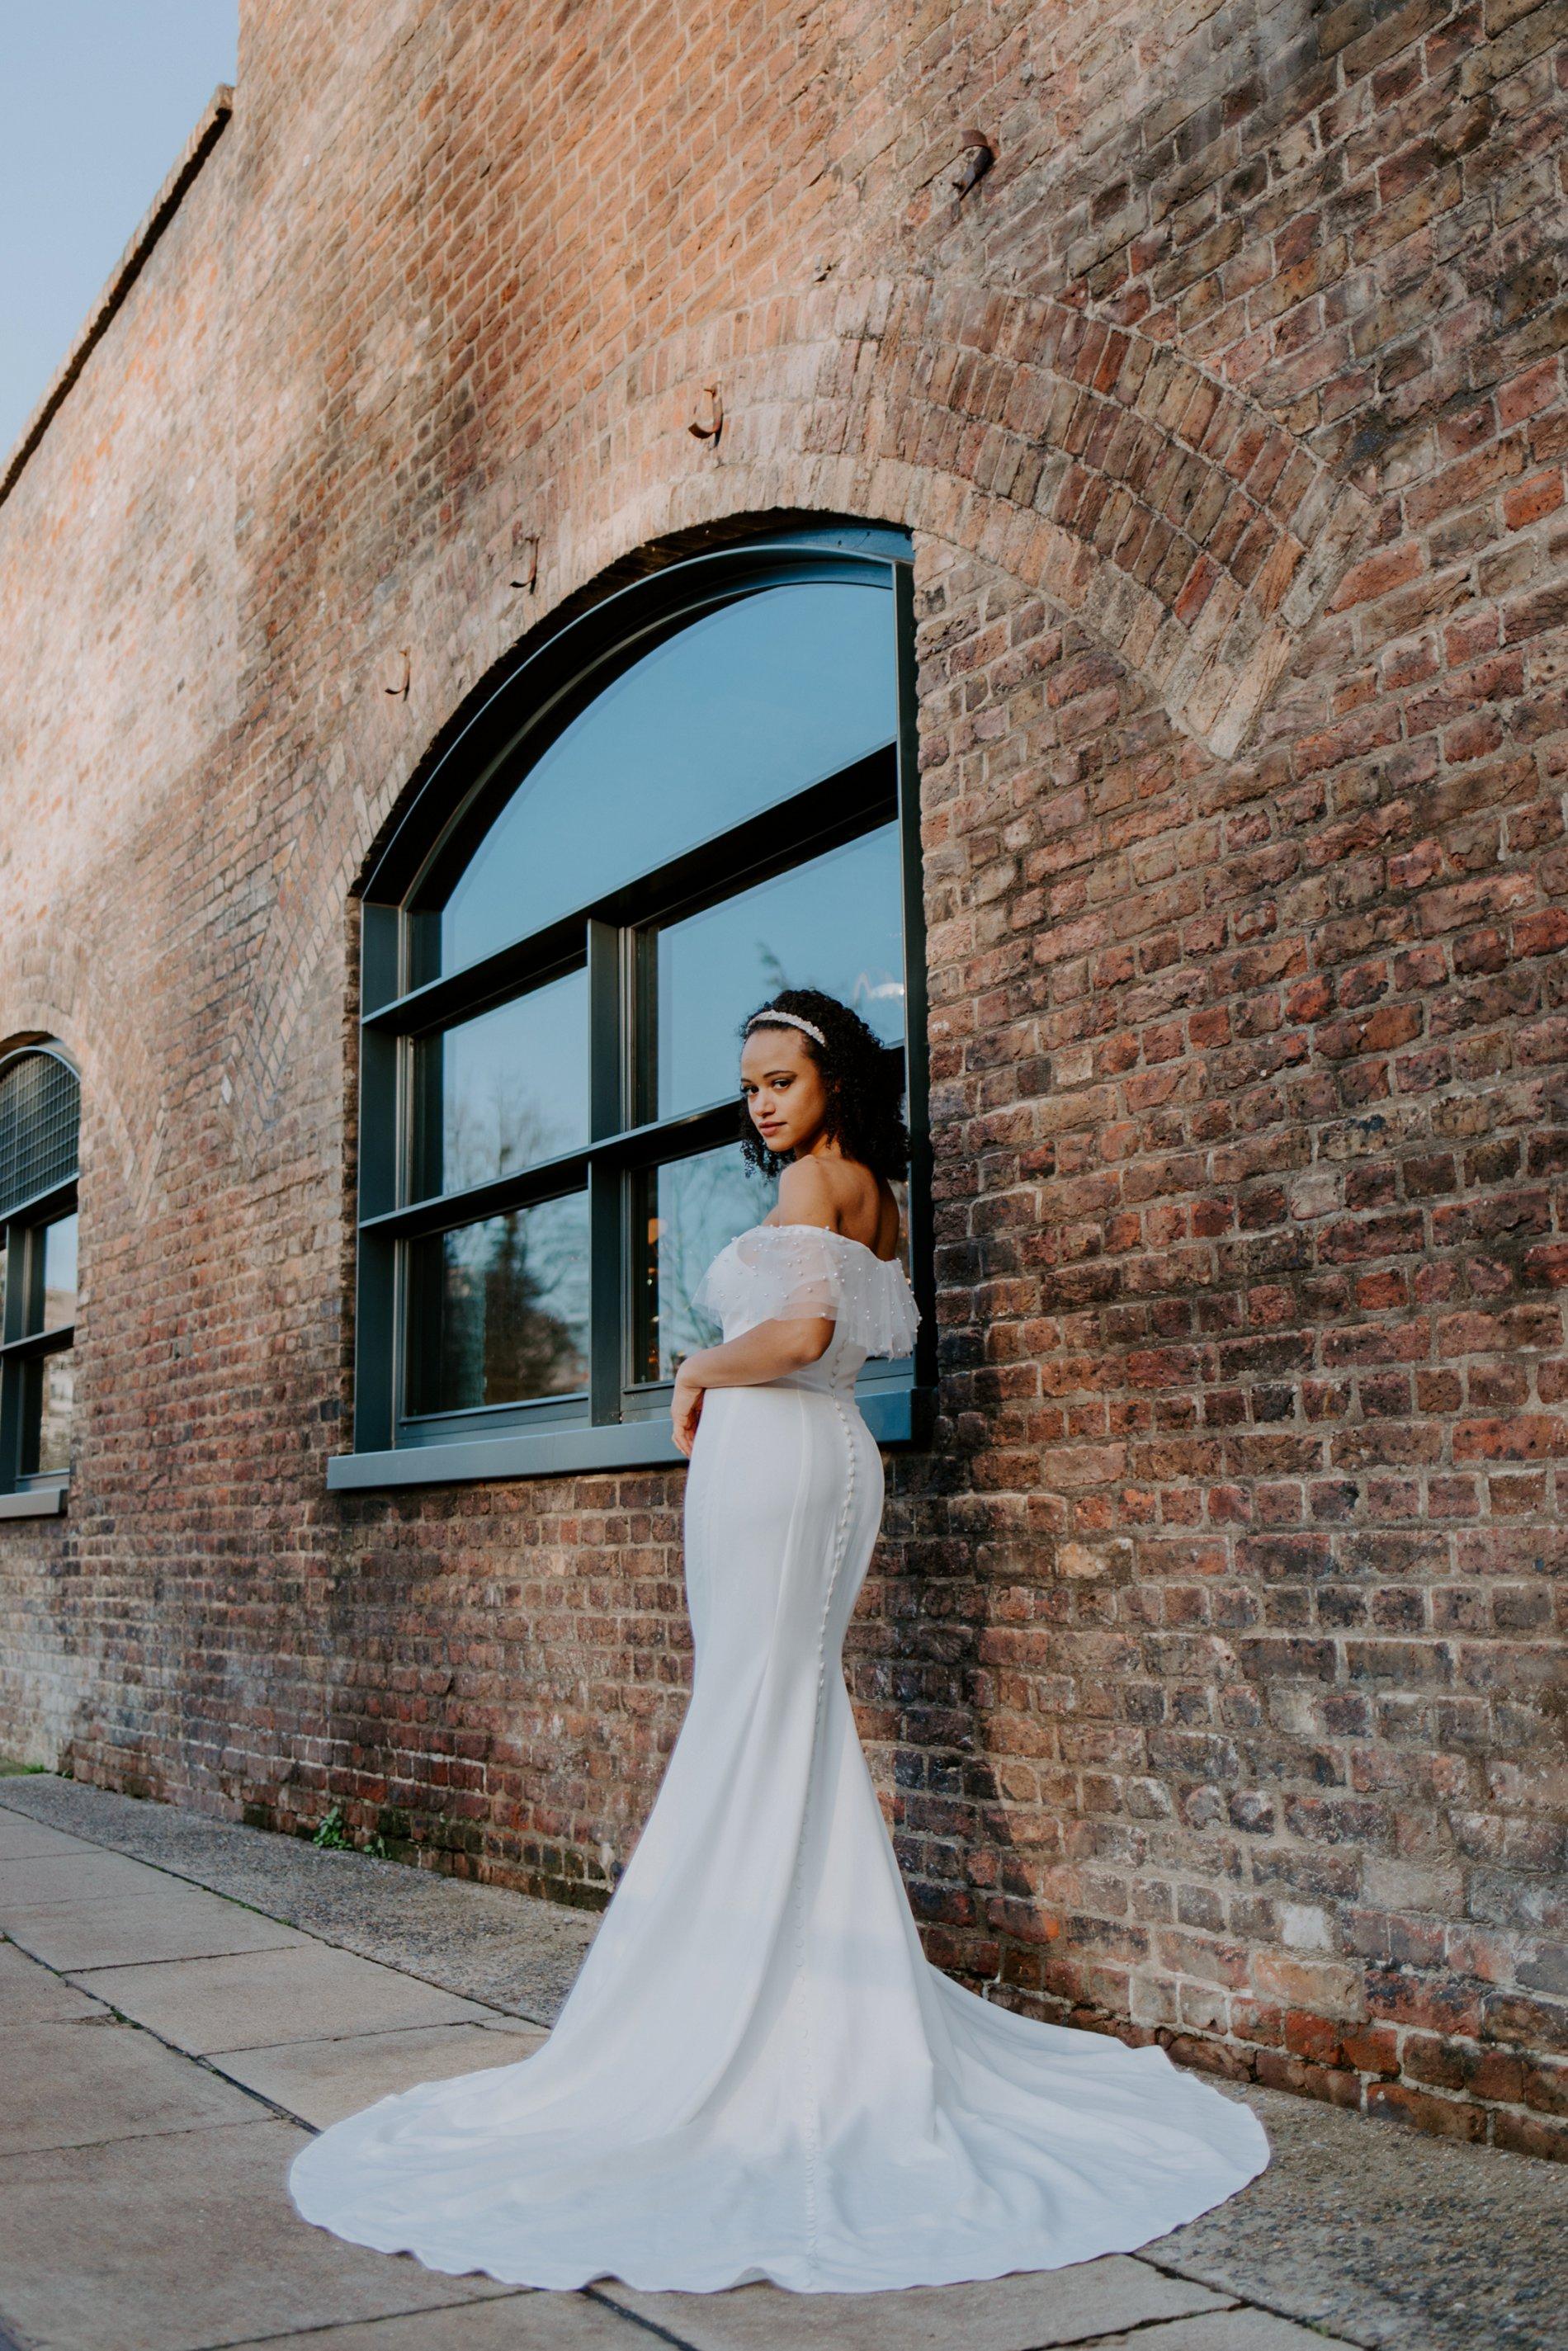 City Wedding Styled Shoot at Coal Drops Yard (c) Emztography (49)